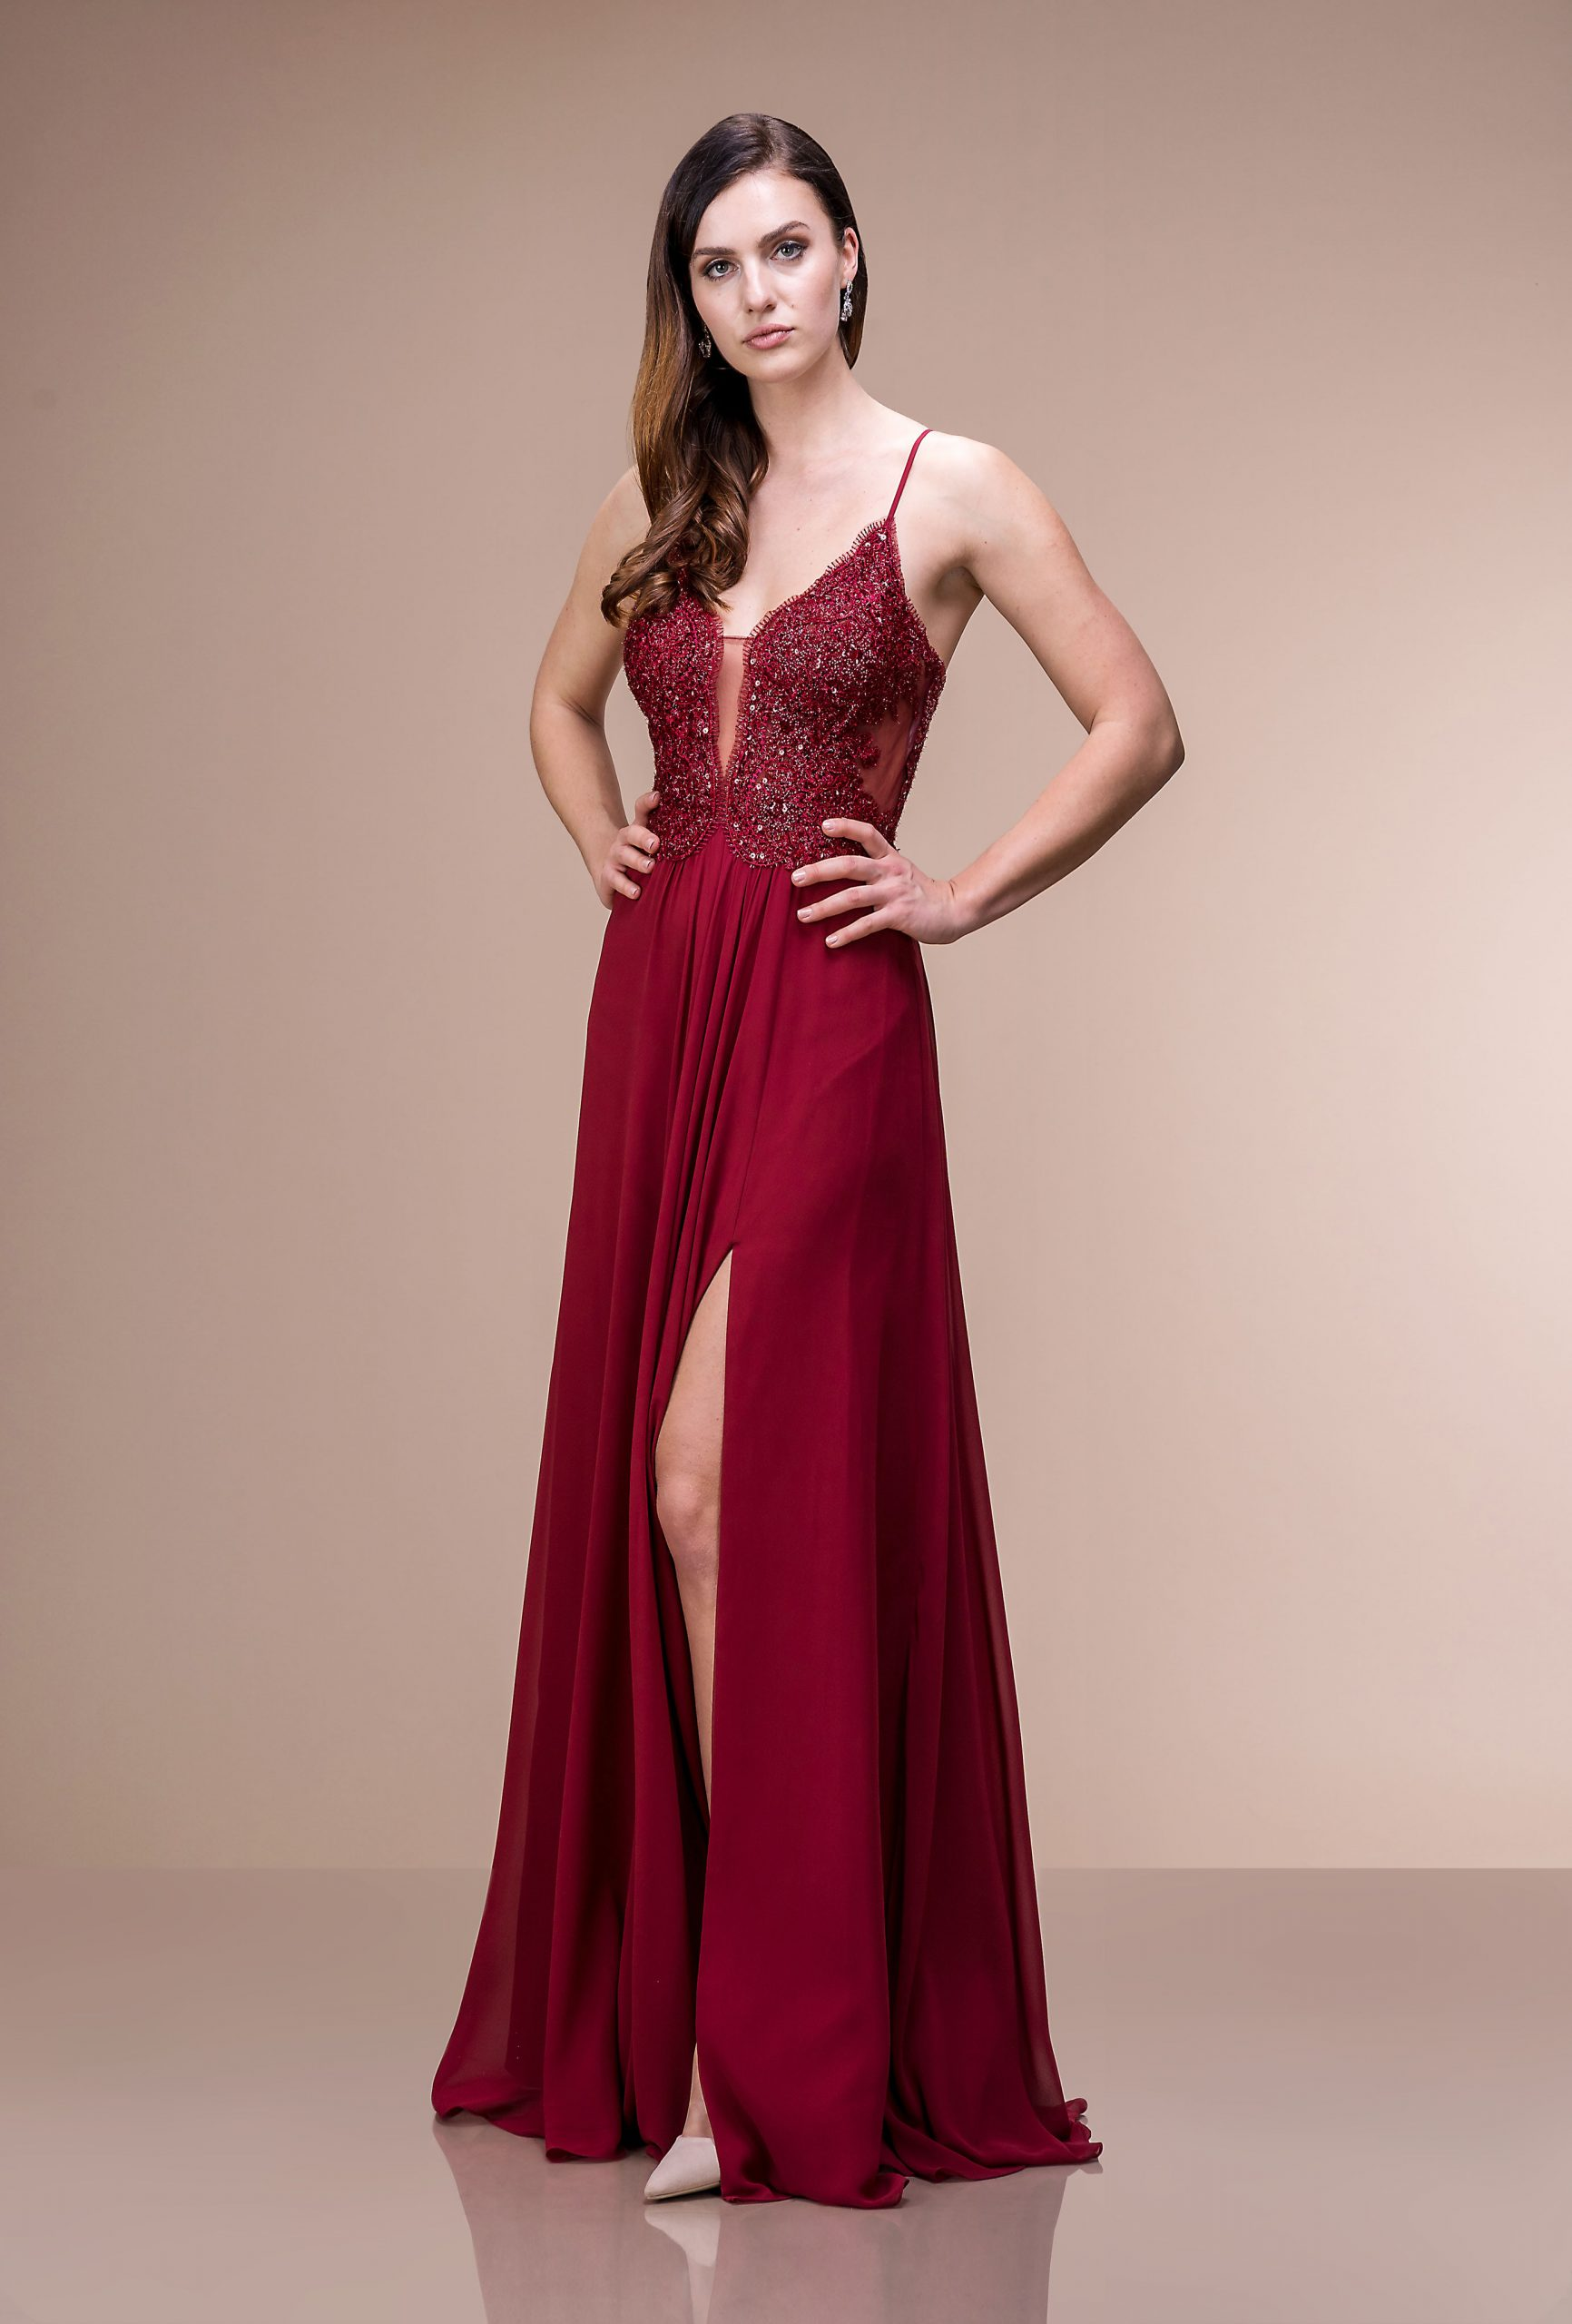 20 Luxurius Abendkleider Rapperswil VertriebDesigner Großartig Abendkleider Rapperswil Design